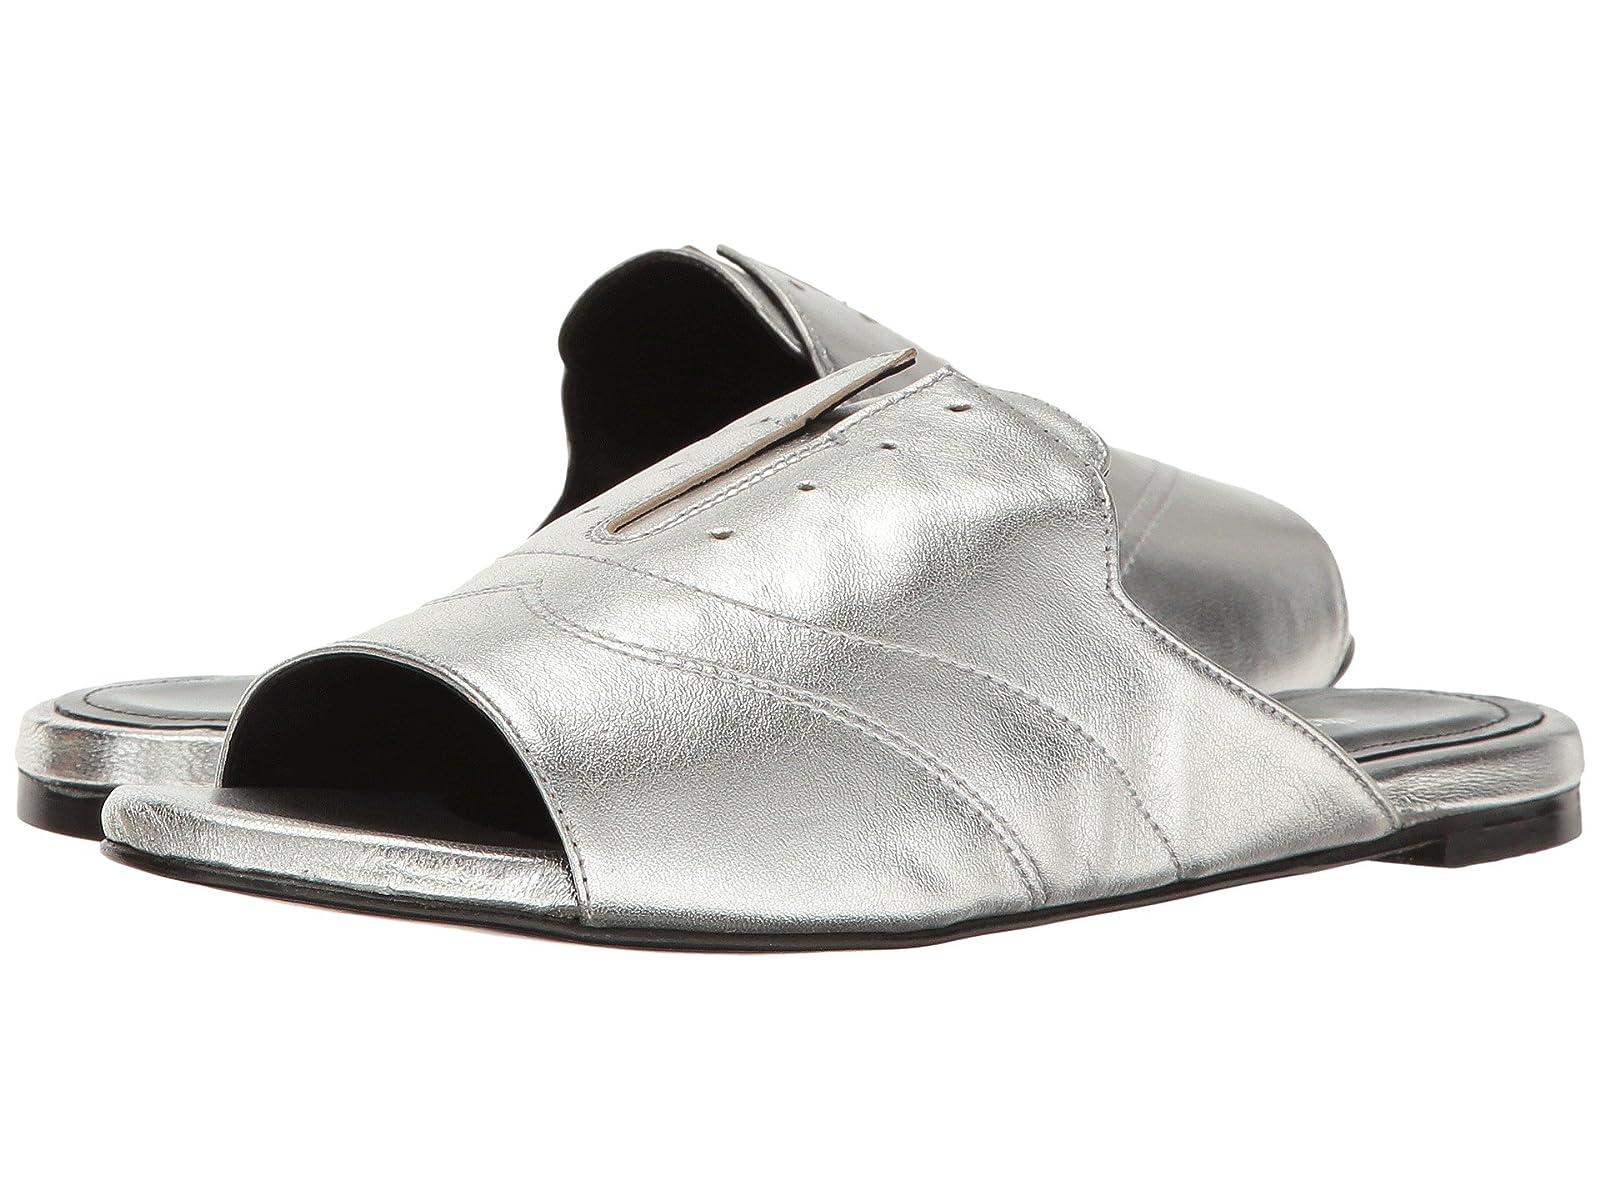 Charles by Charles David Charles David - SmithCheap and distinctive eye-catching shoes